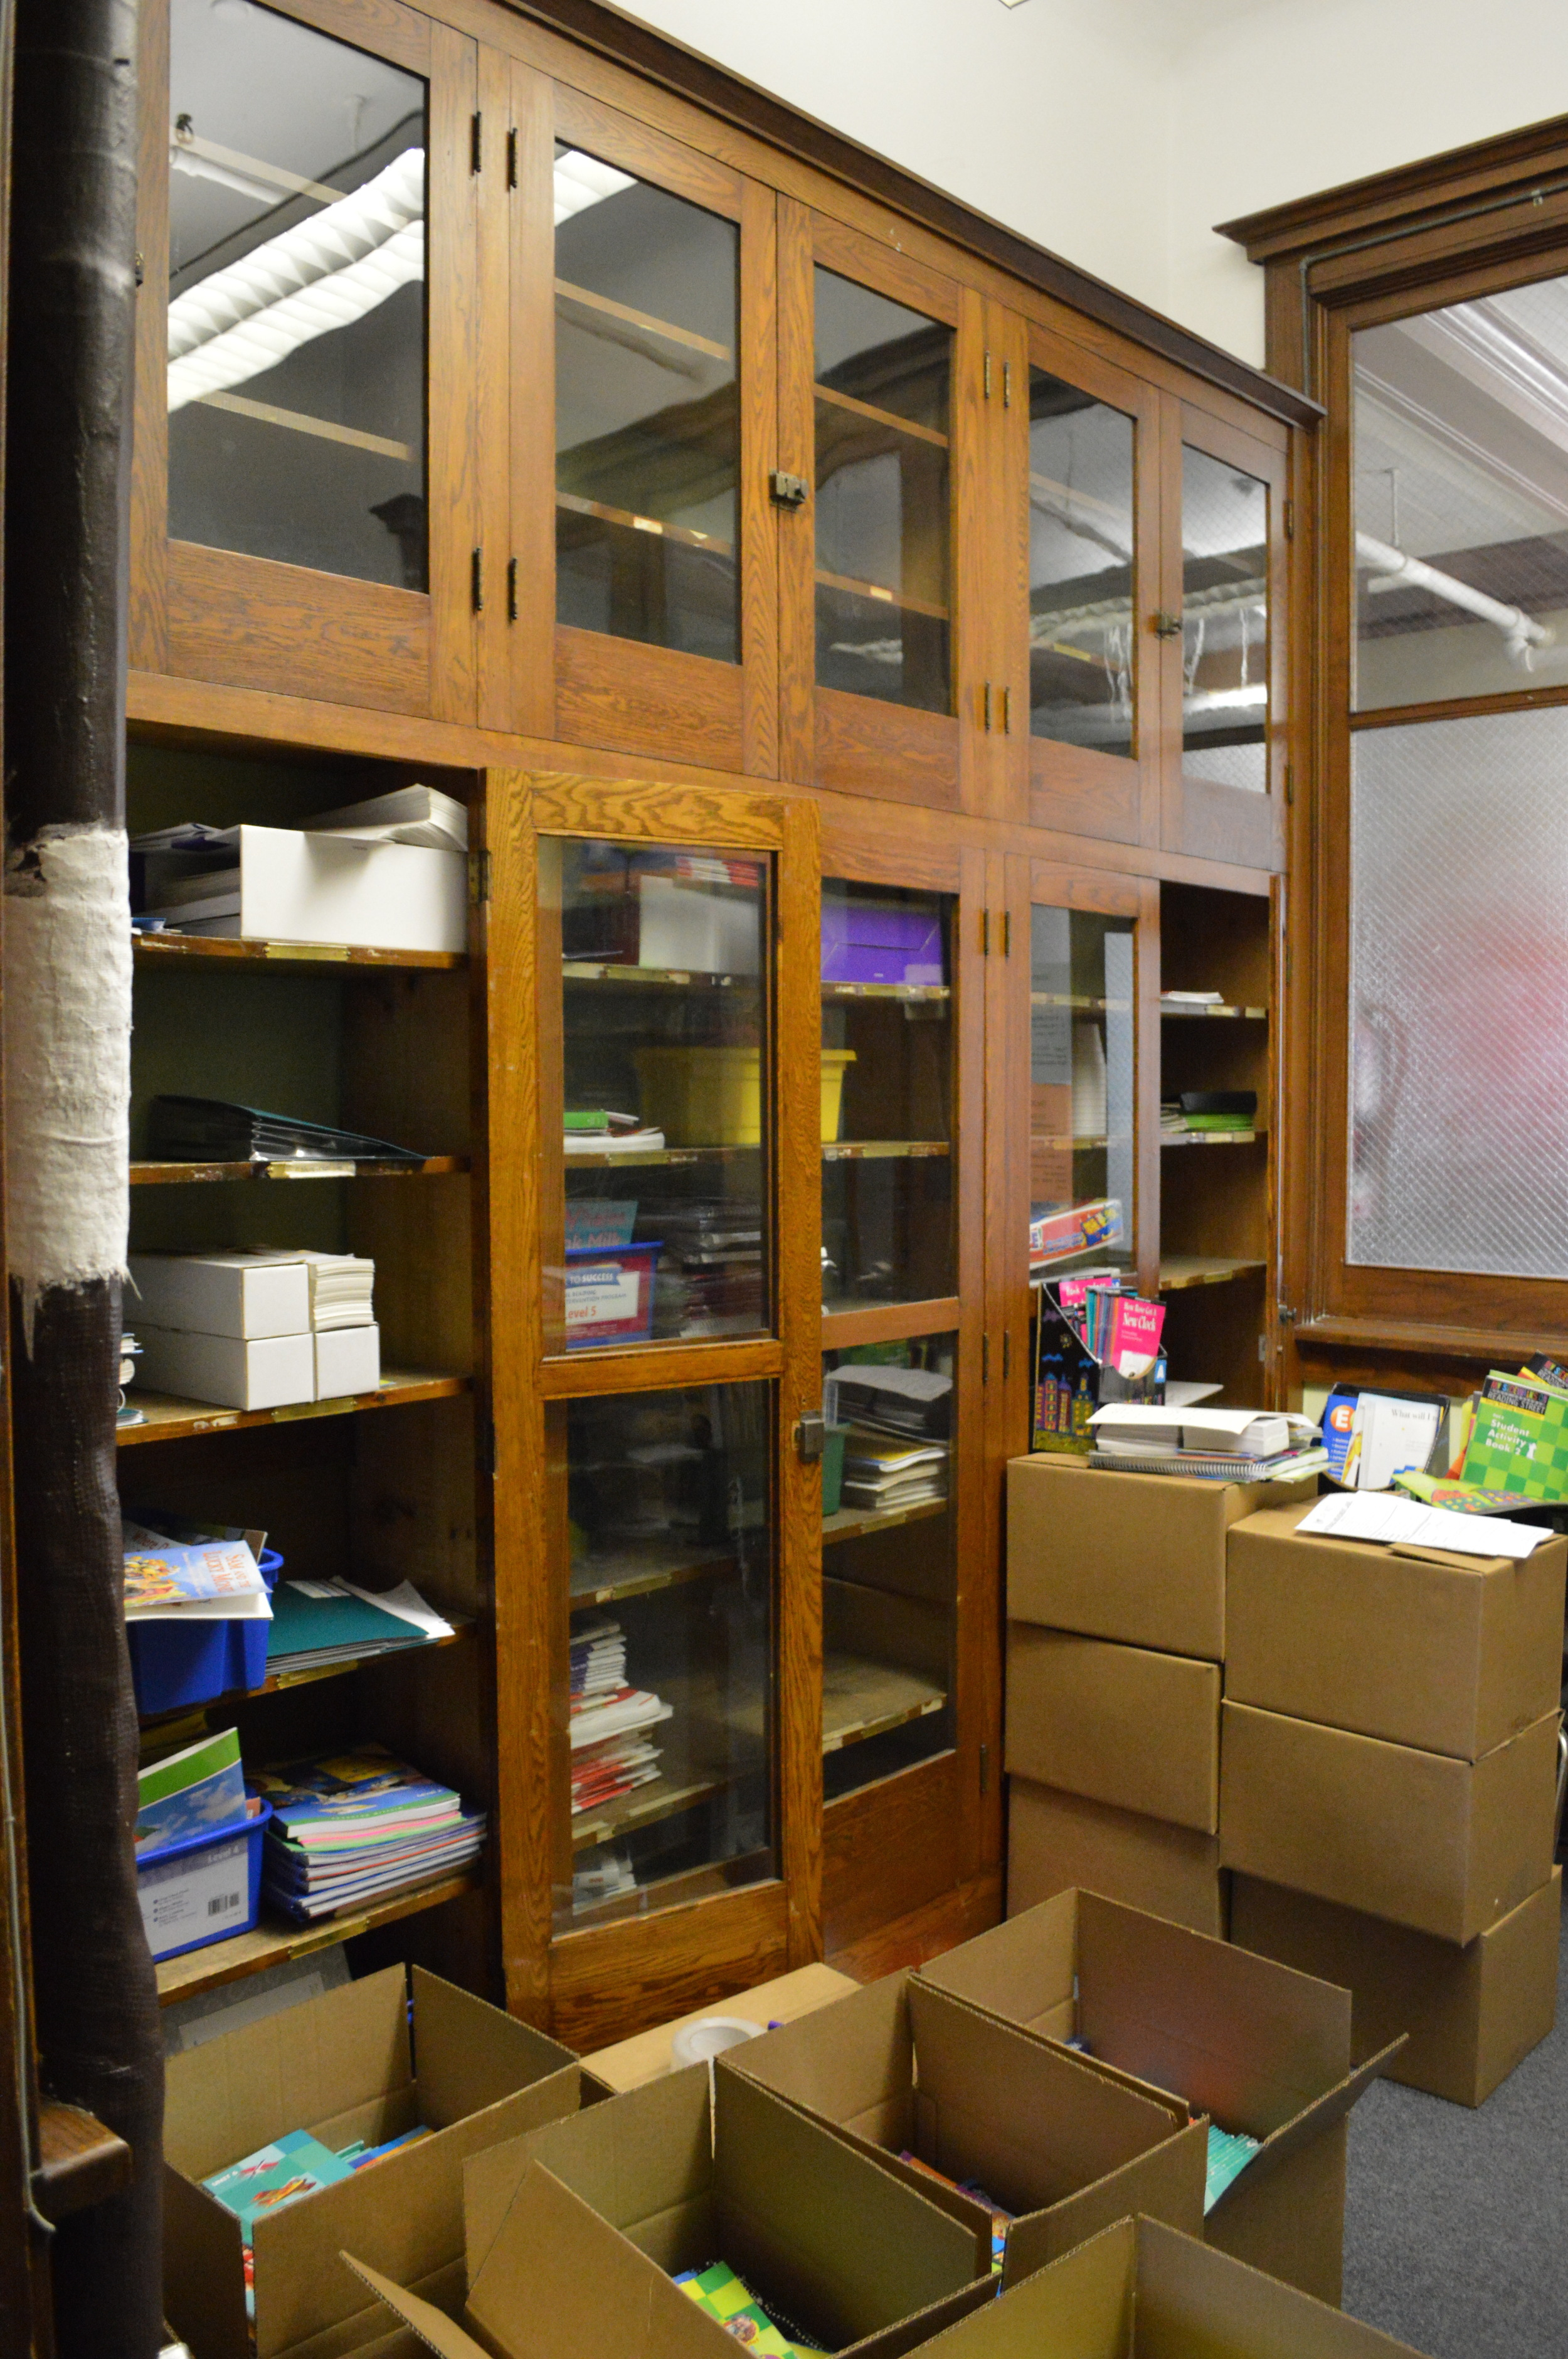 Original built-ins in an office at Walker Elementary School.